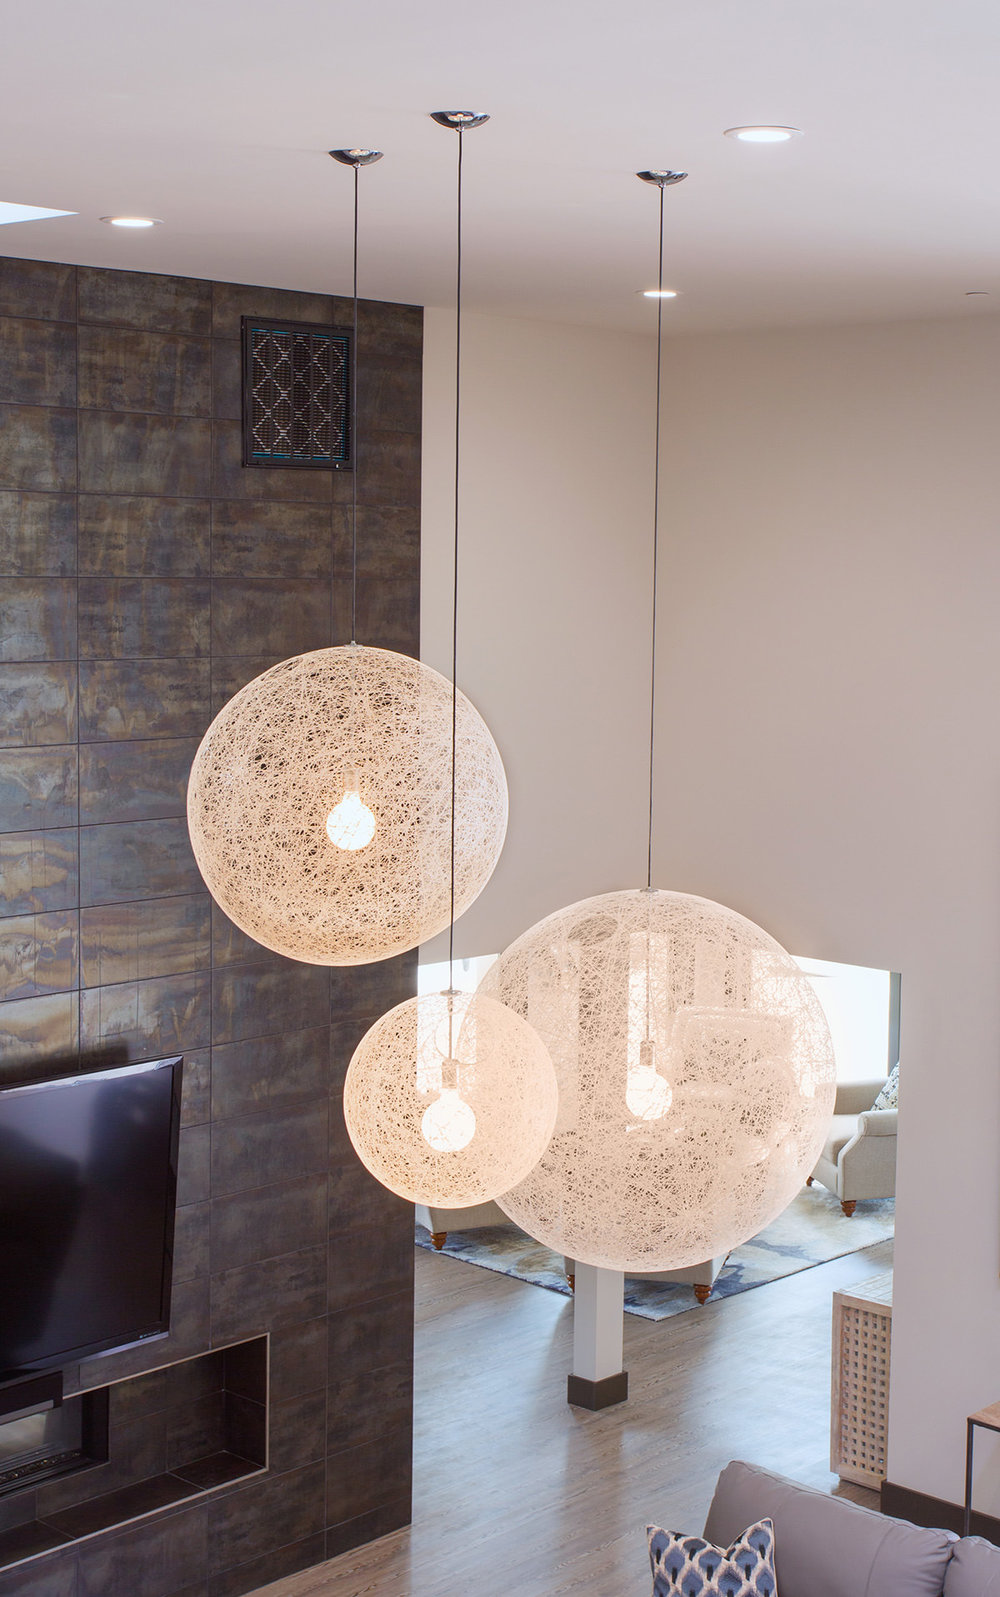 custom-lighting-interior-design-los-altos-california-ktj-design-co-1.jpg